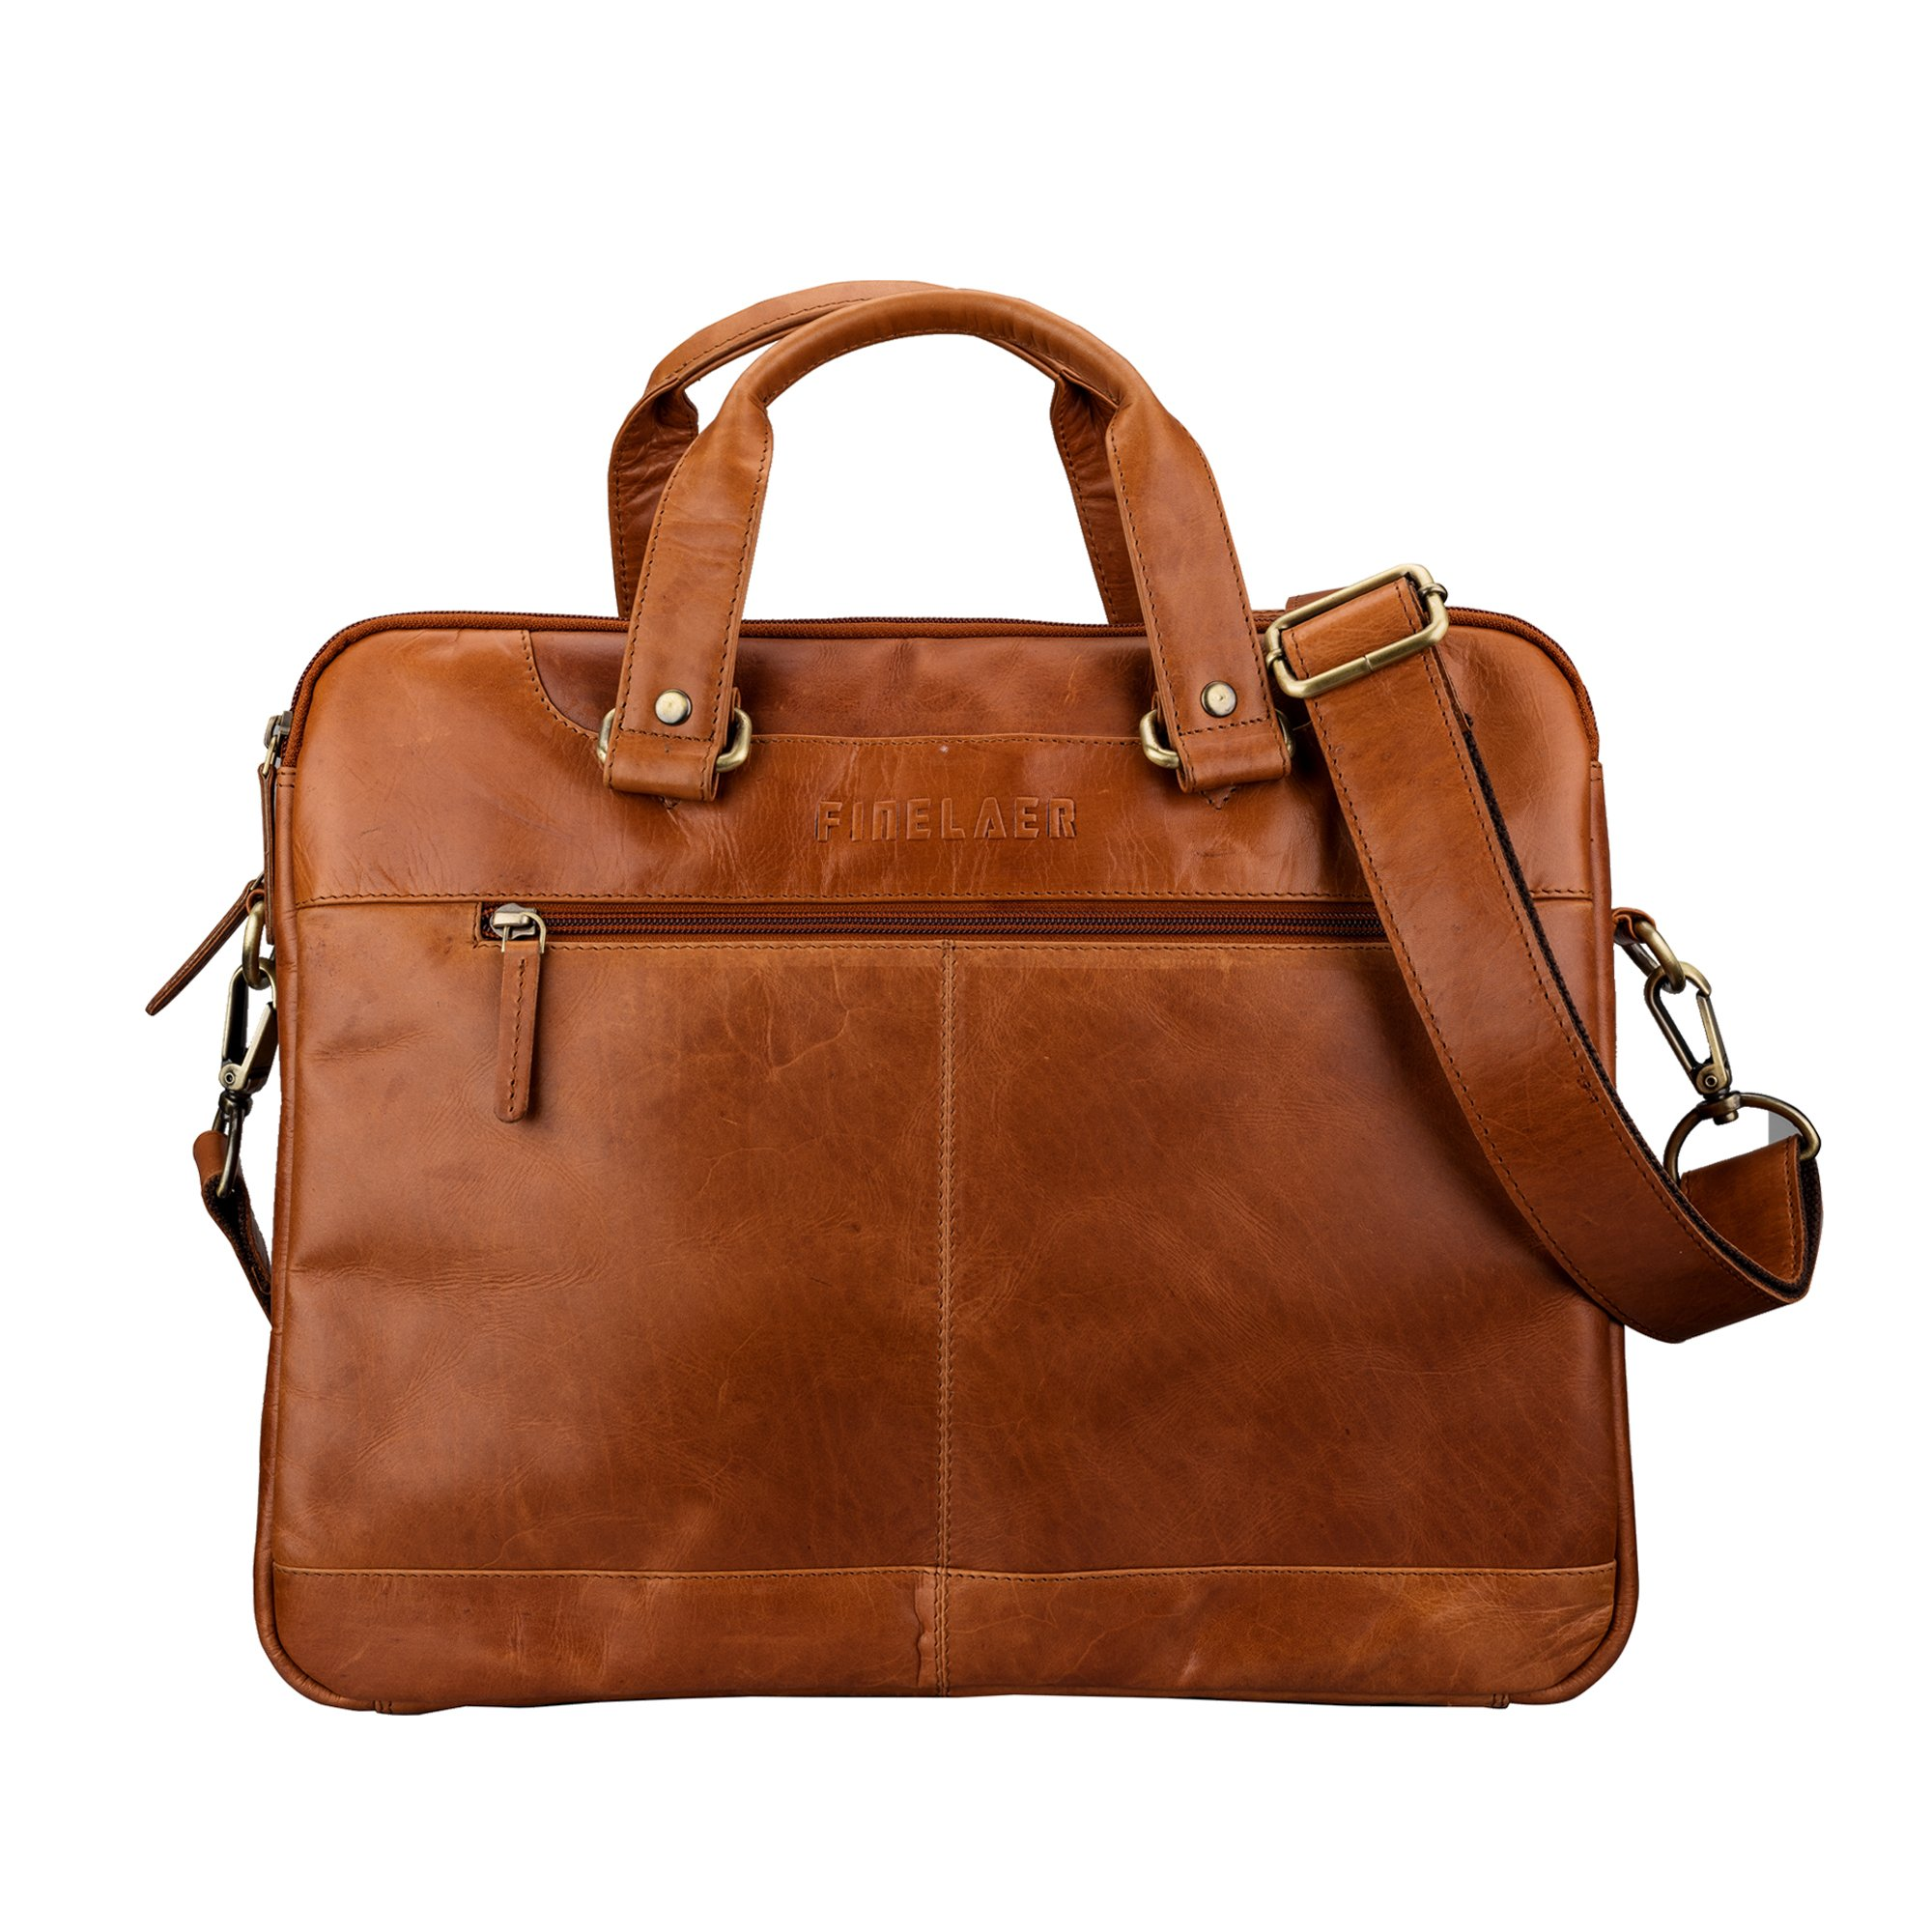 Finelaer Leather Laptop Computer Messenger Zipper Bag Brown with Trolley Sleeve for Men Women